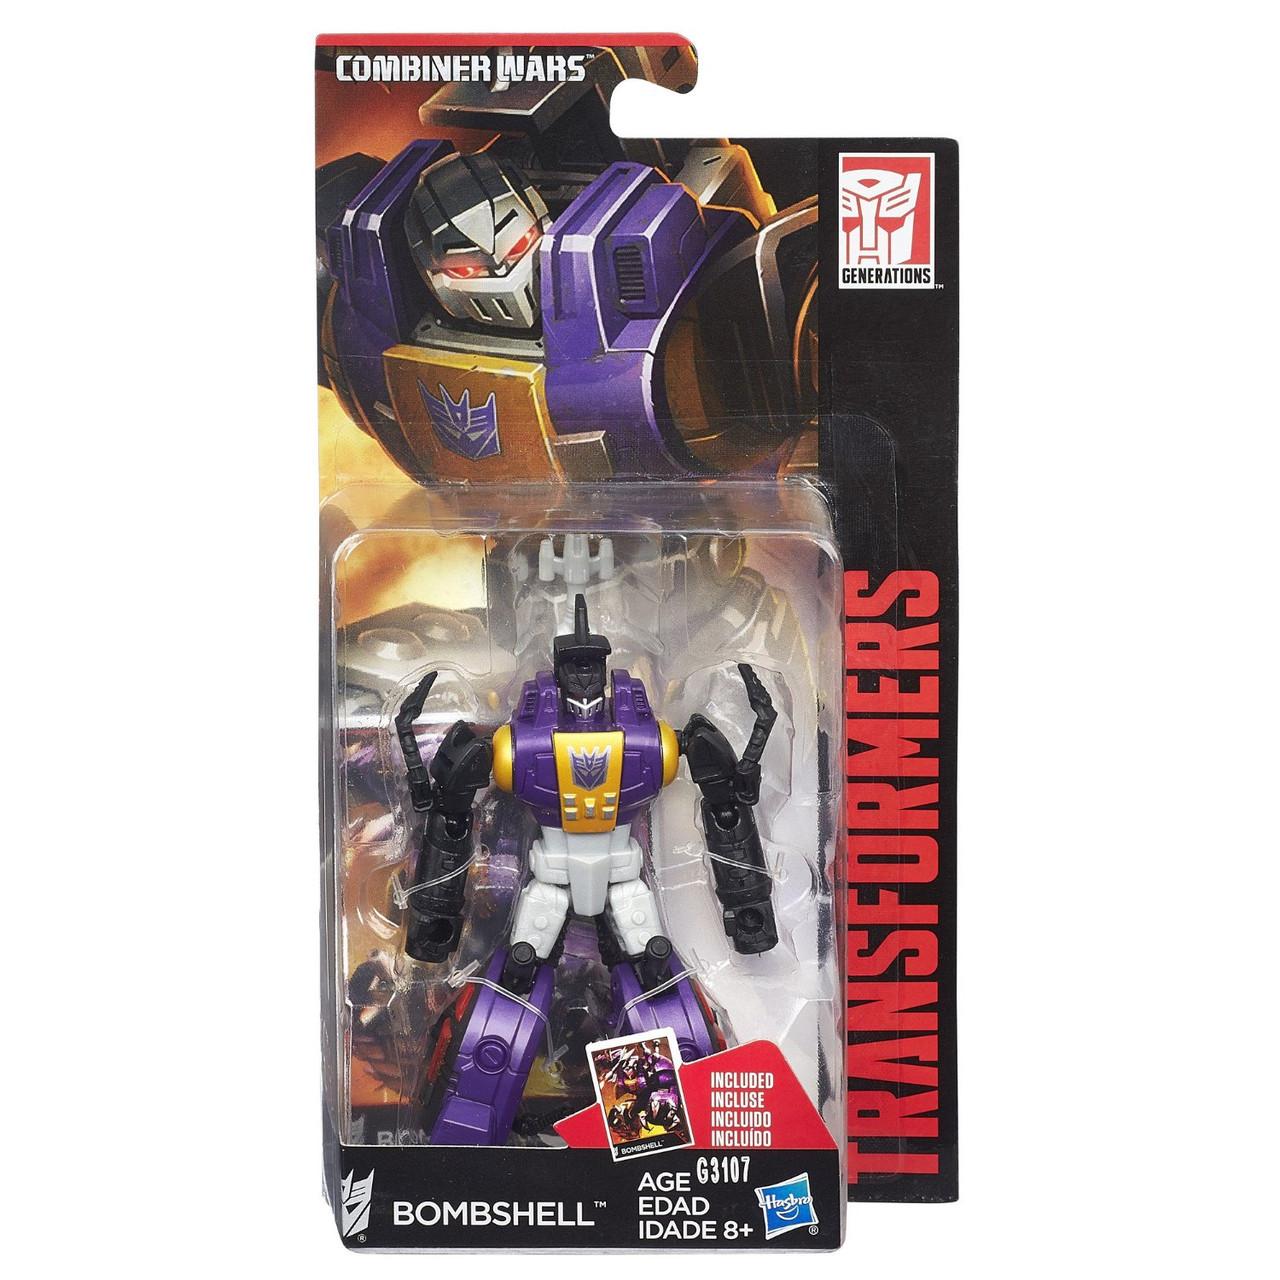 Робот-трансформер Бомбшелл (жук) - Bombshell, Combiner Wars, Legends Class, Generations, Hasbro